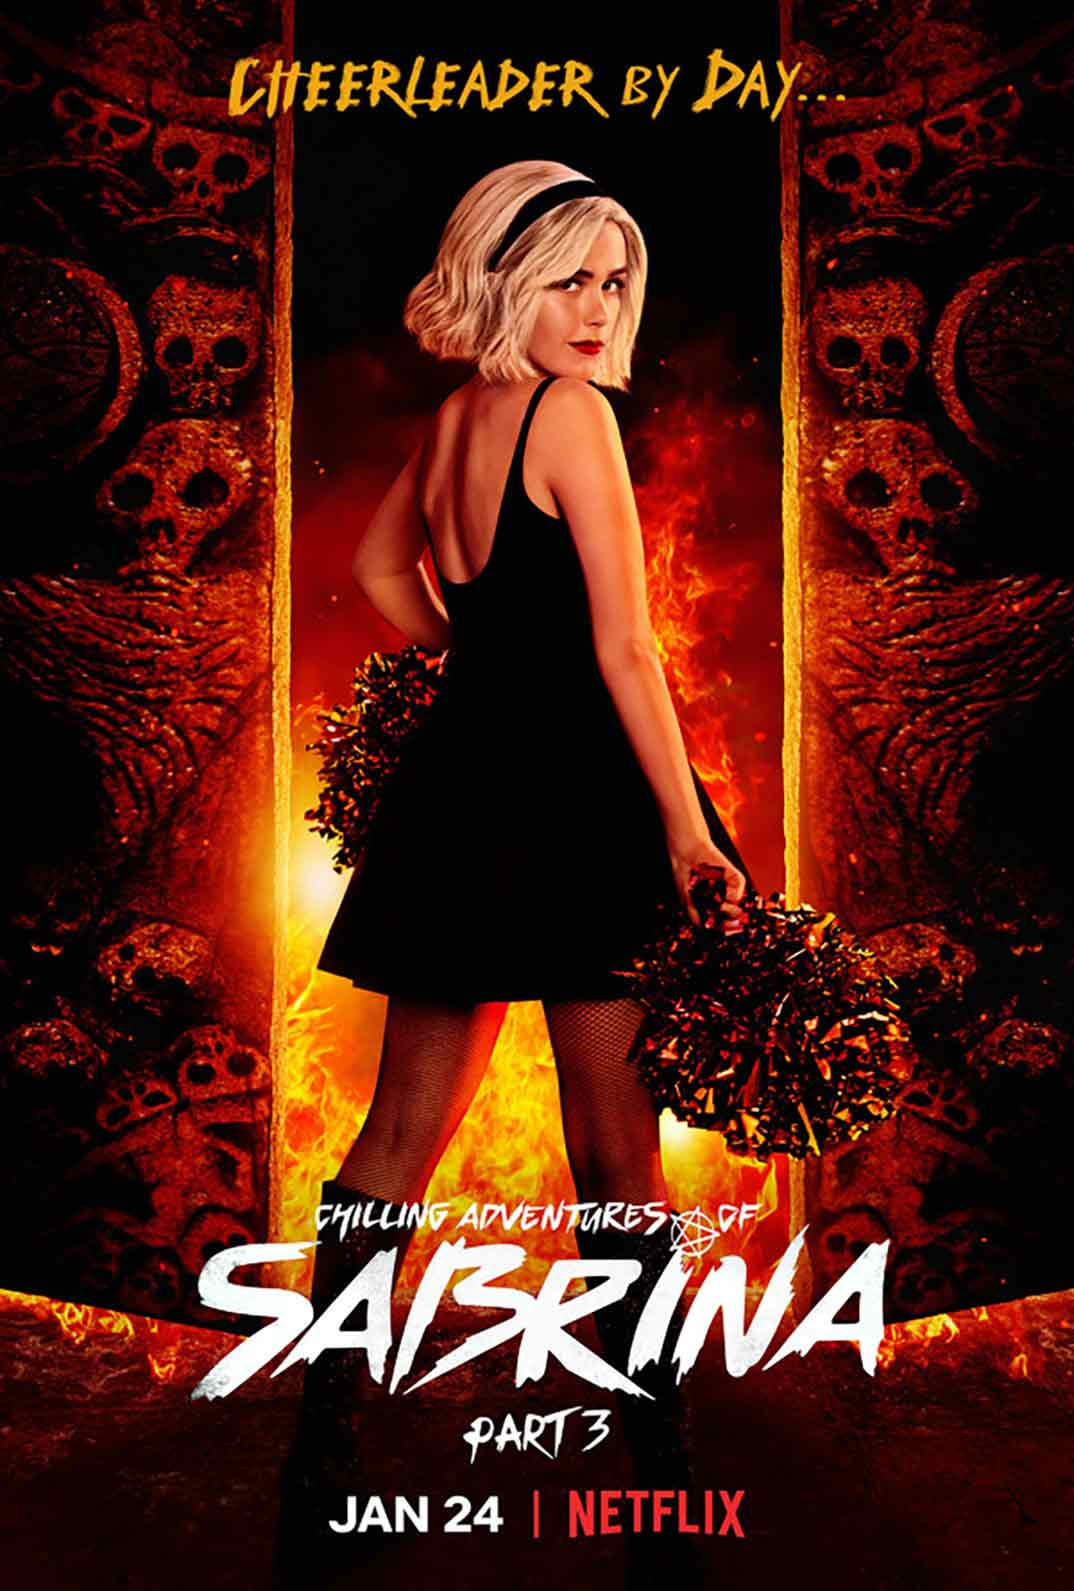 Las escalofriantes aventuras de Sabrina 3 © Netflix